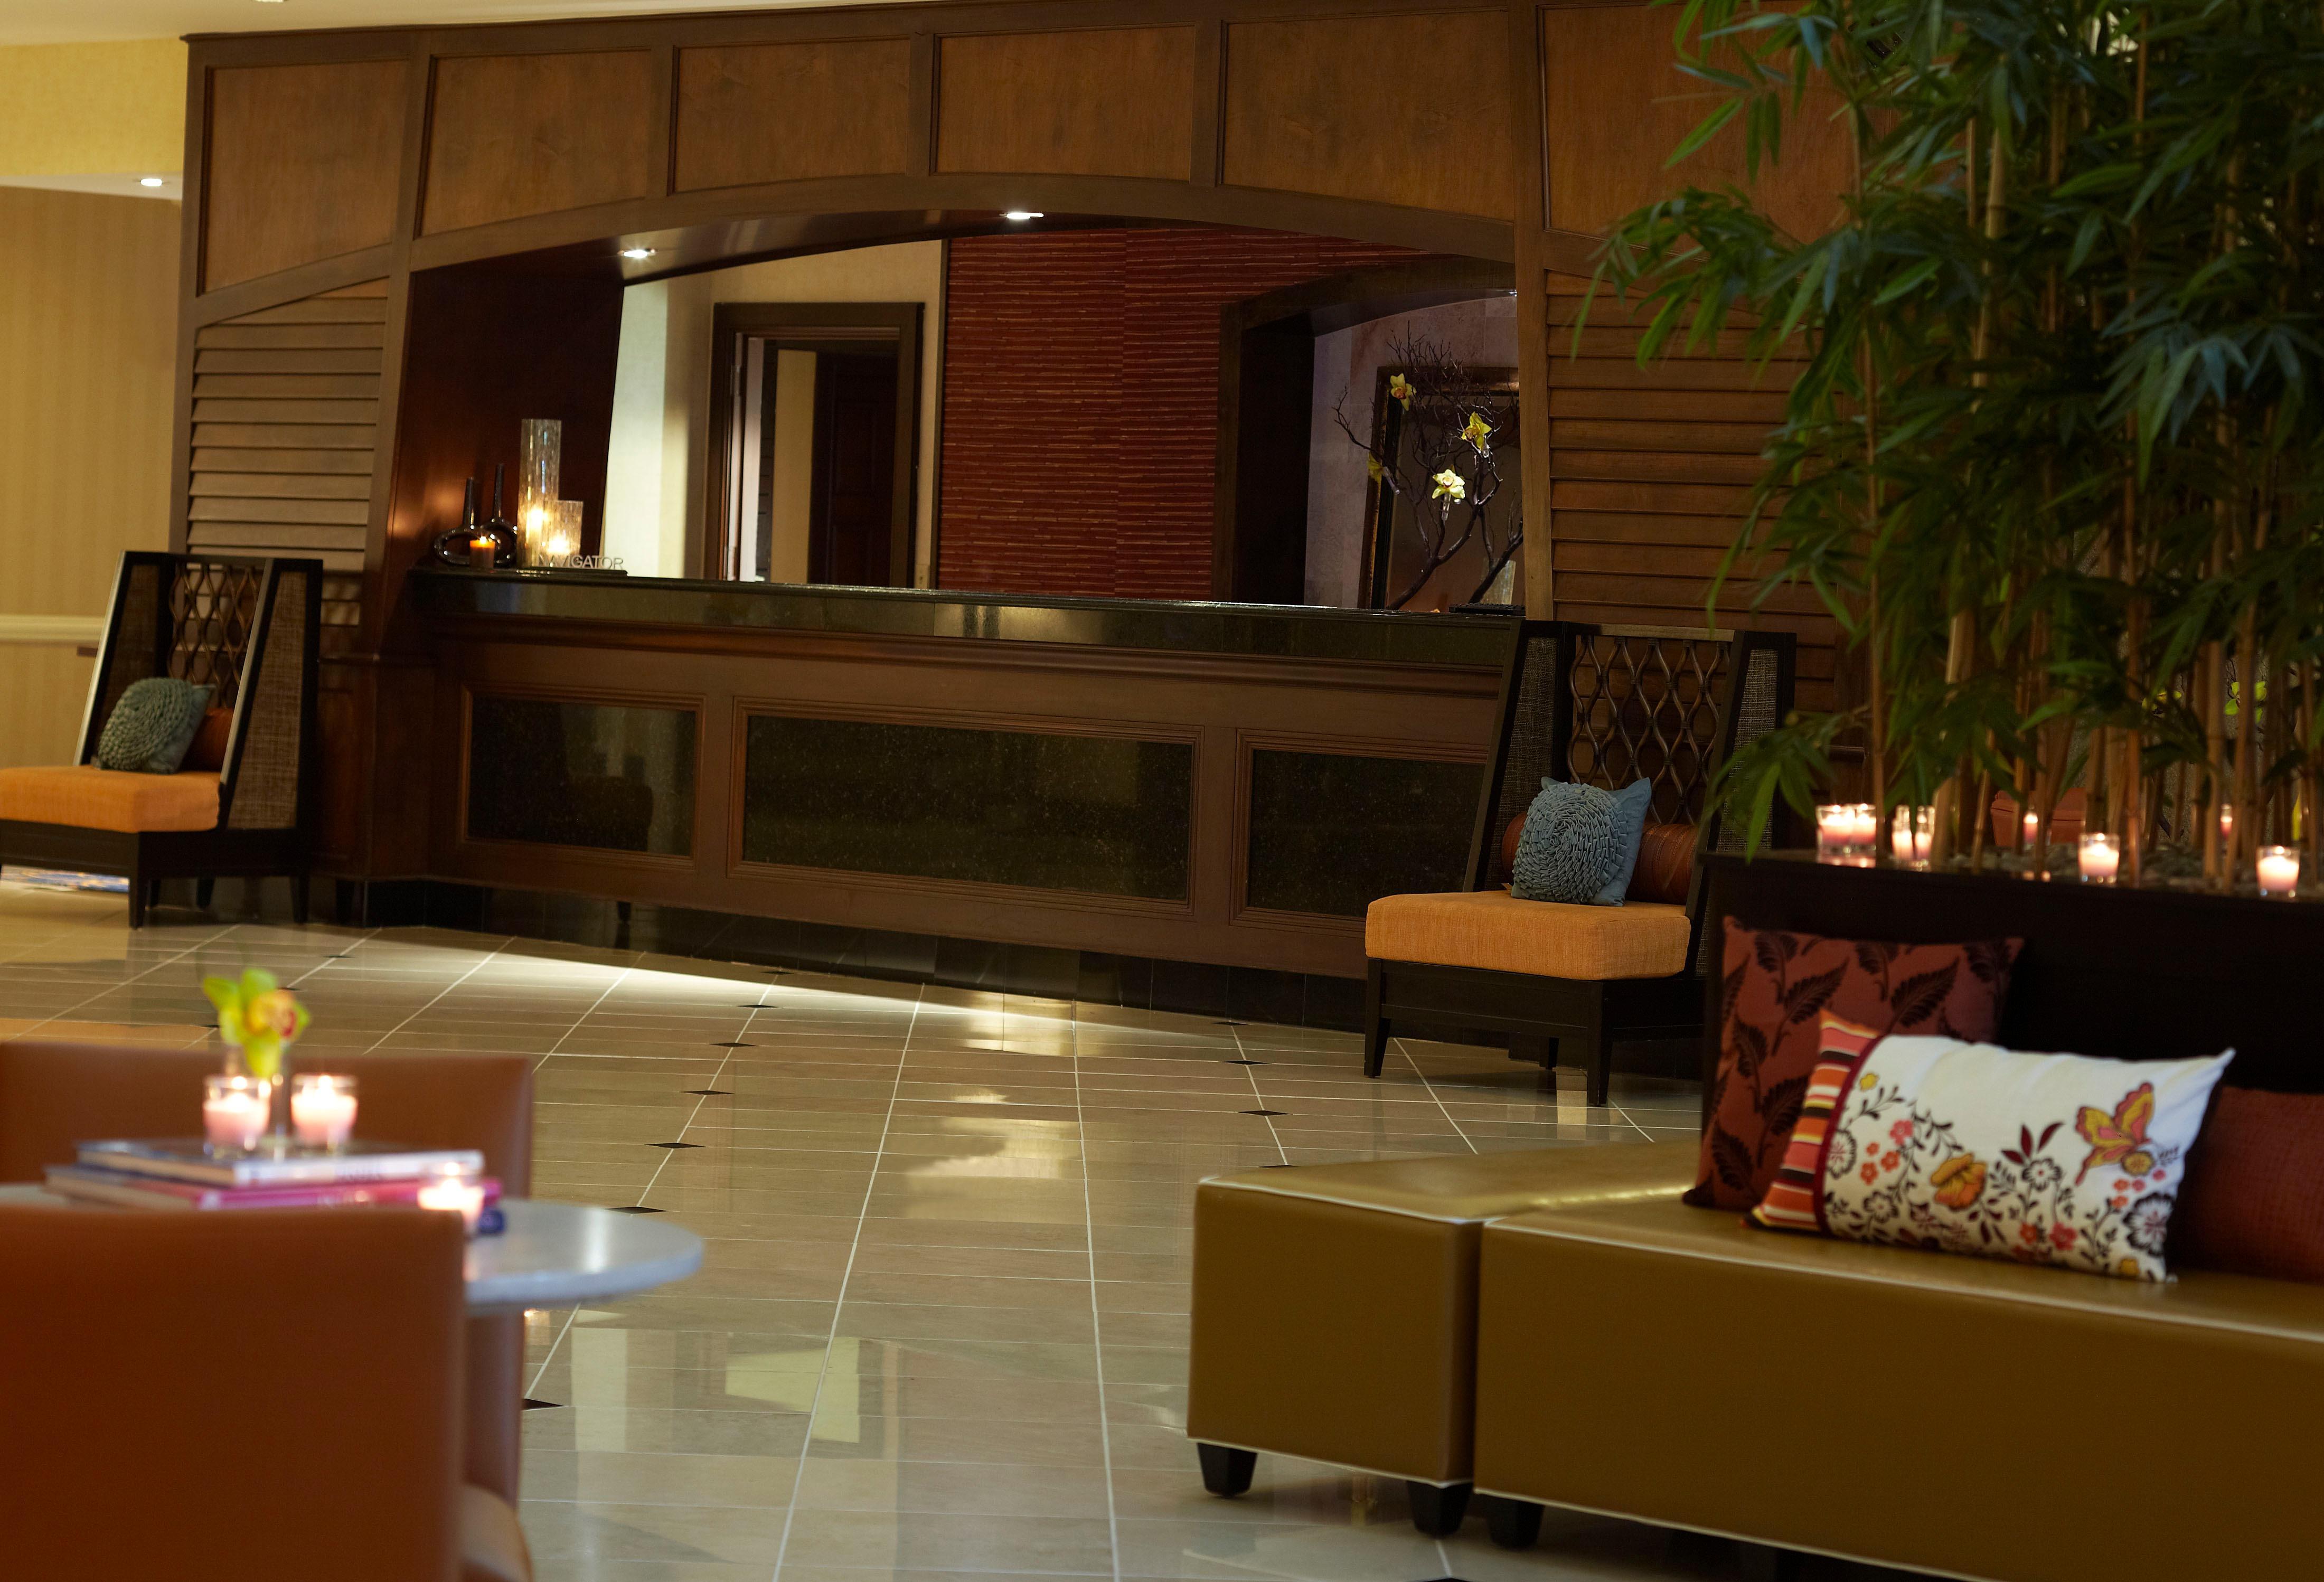 Renaissance Fort Lauderdale Cruise Port Hotel image 20